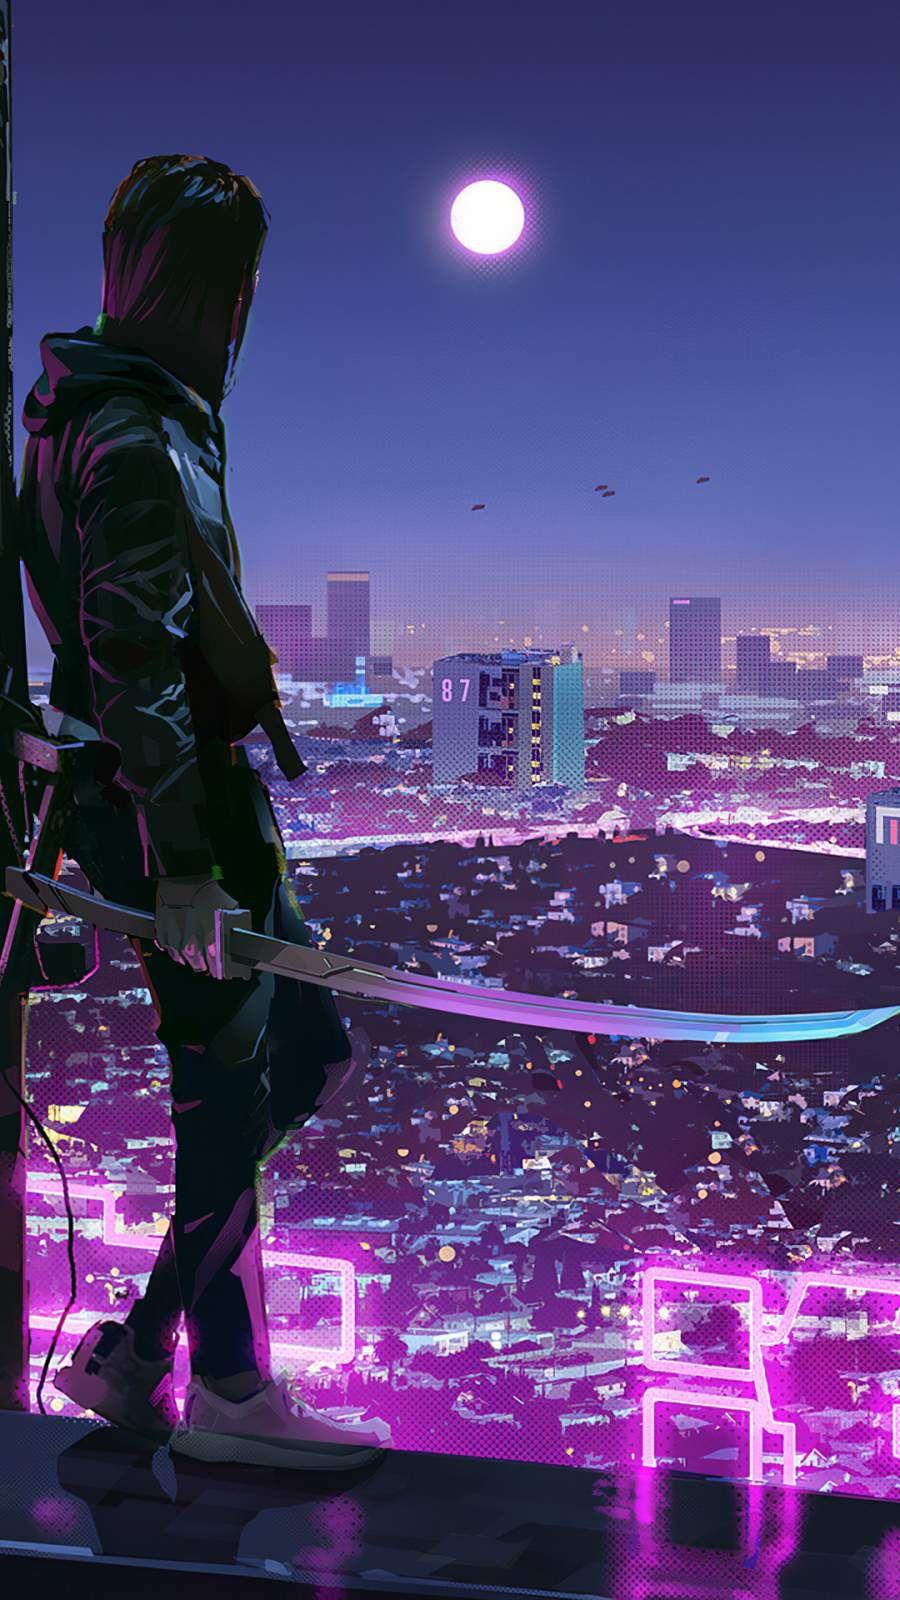 City Ninja Iphone Wallpaper Anime Backgrounds Wallpapers Ninja Wallpaper Anime Scenery